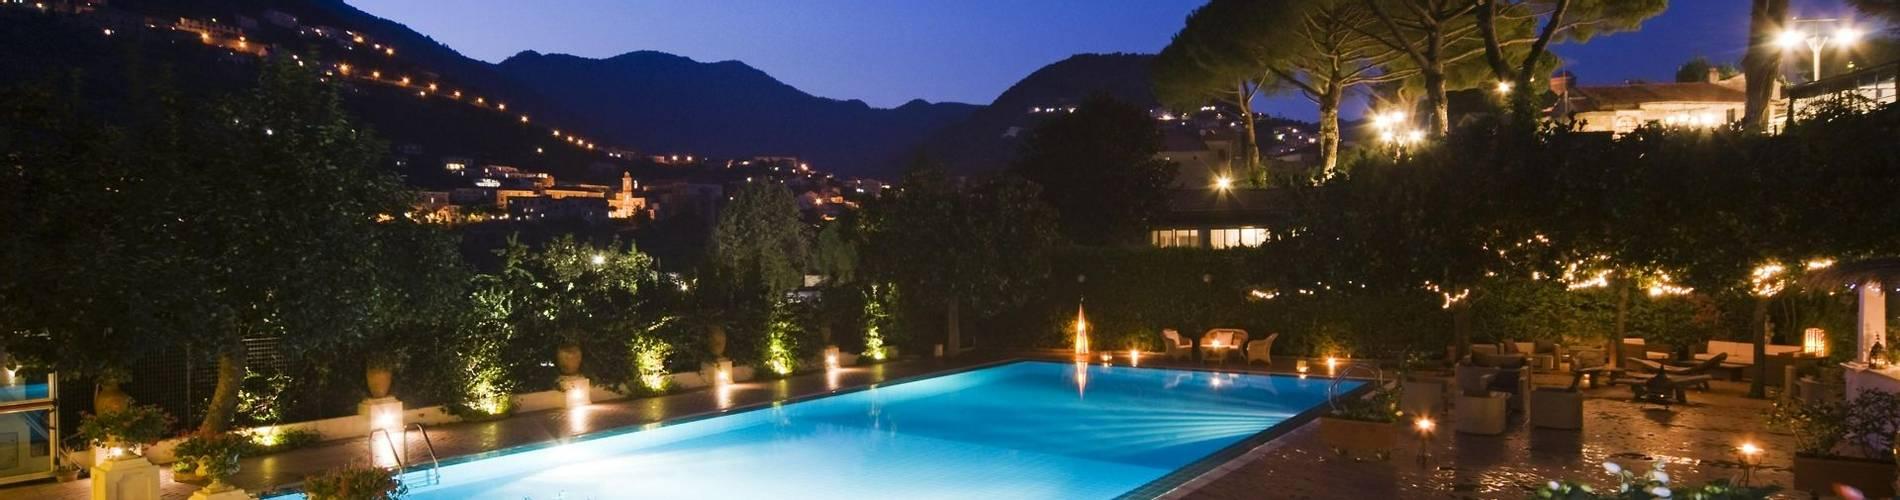 Ravello Palumbo Hotels